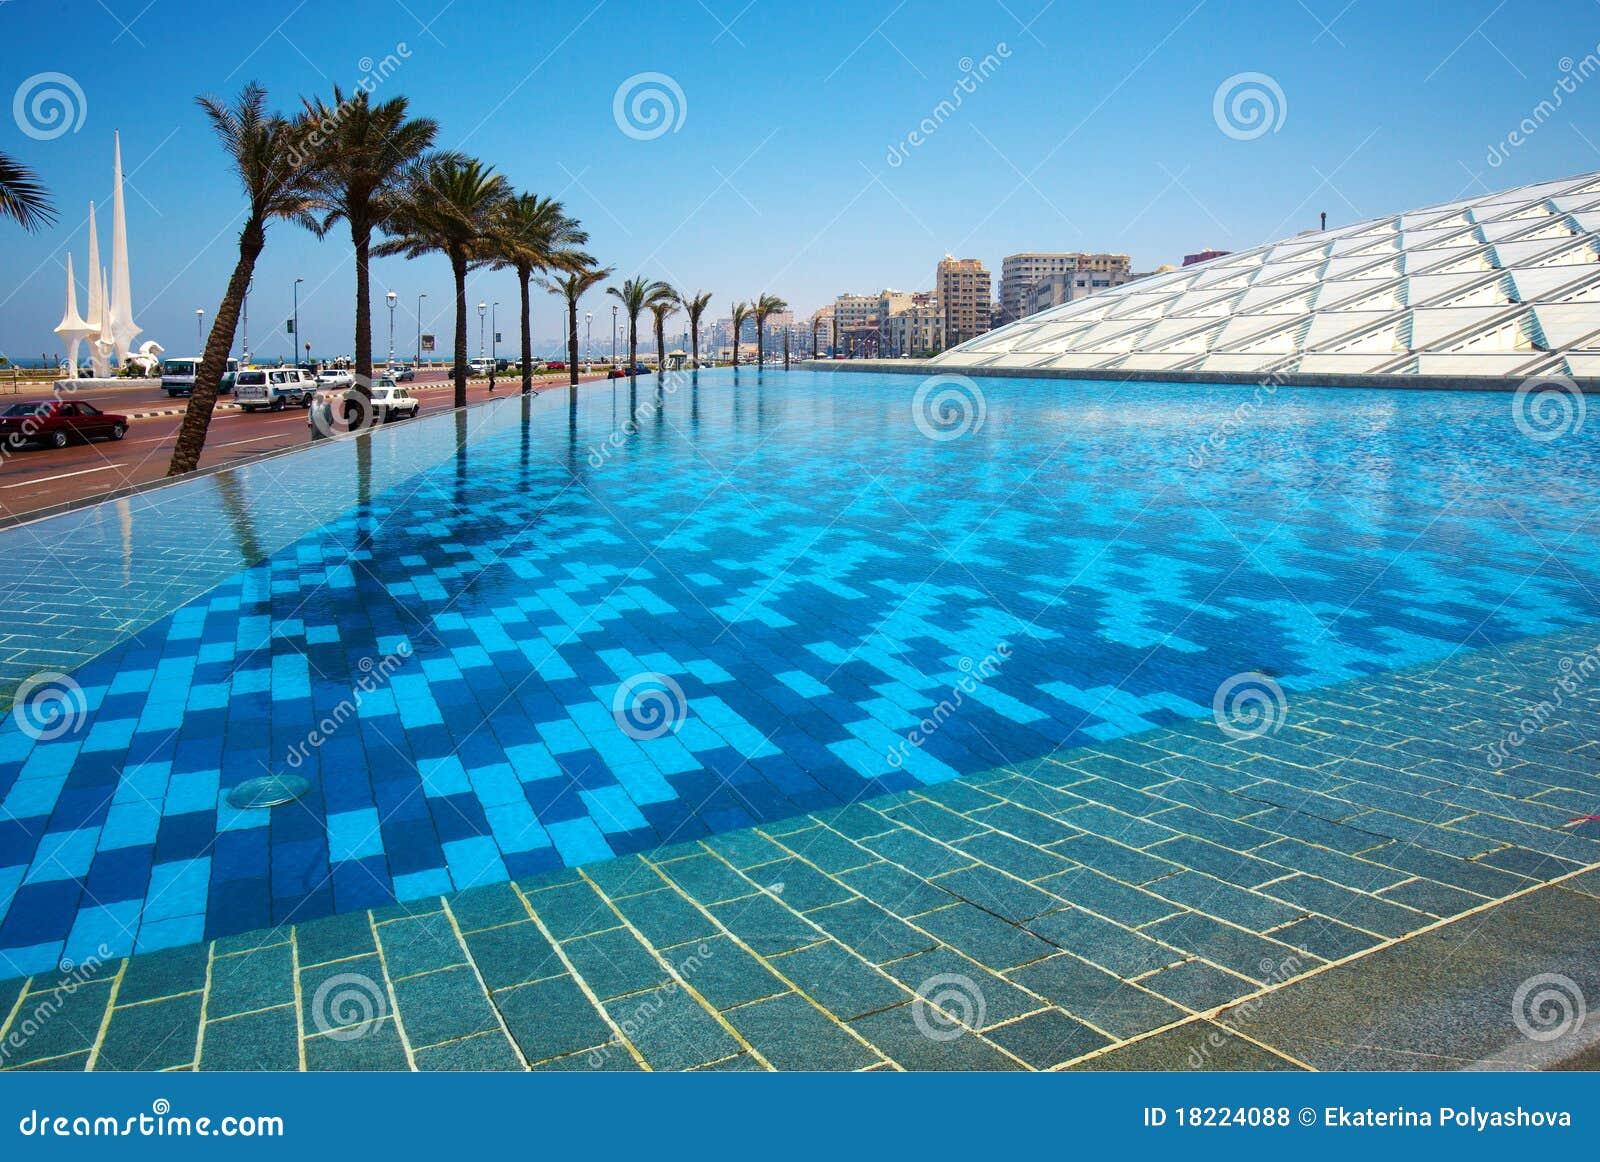 Web Design Egypt Alexandria